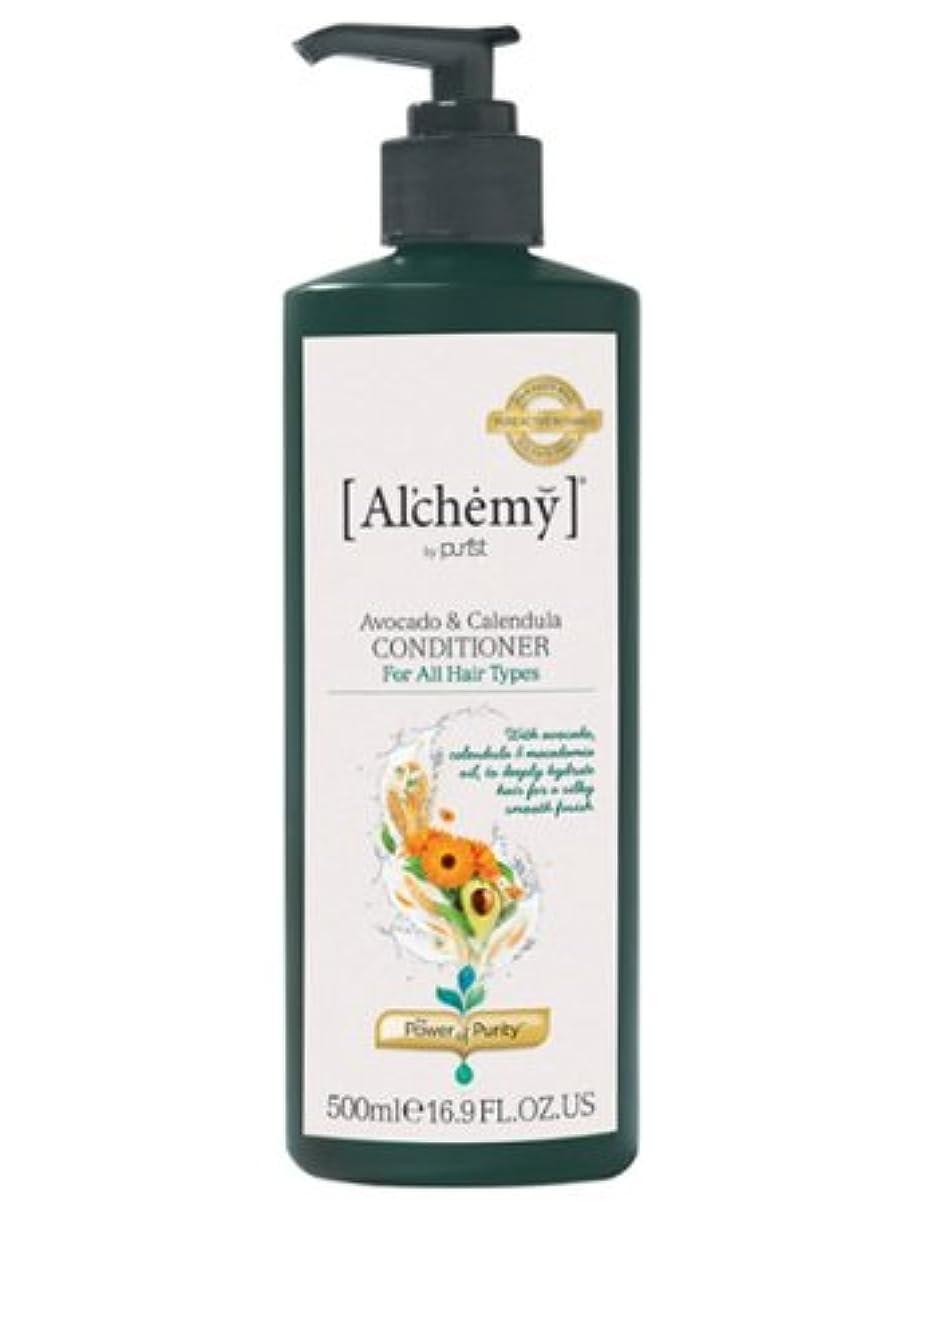 【Al'chemy(alchemy)】アルケミー アボカド&カレデュラ コンディショナー(Avocado&Calendula Conditioner)(ドライ&ロングヘア用)お徳用500ml